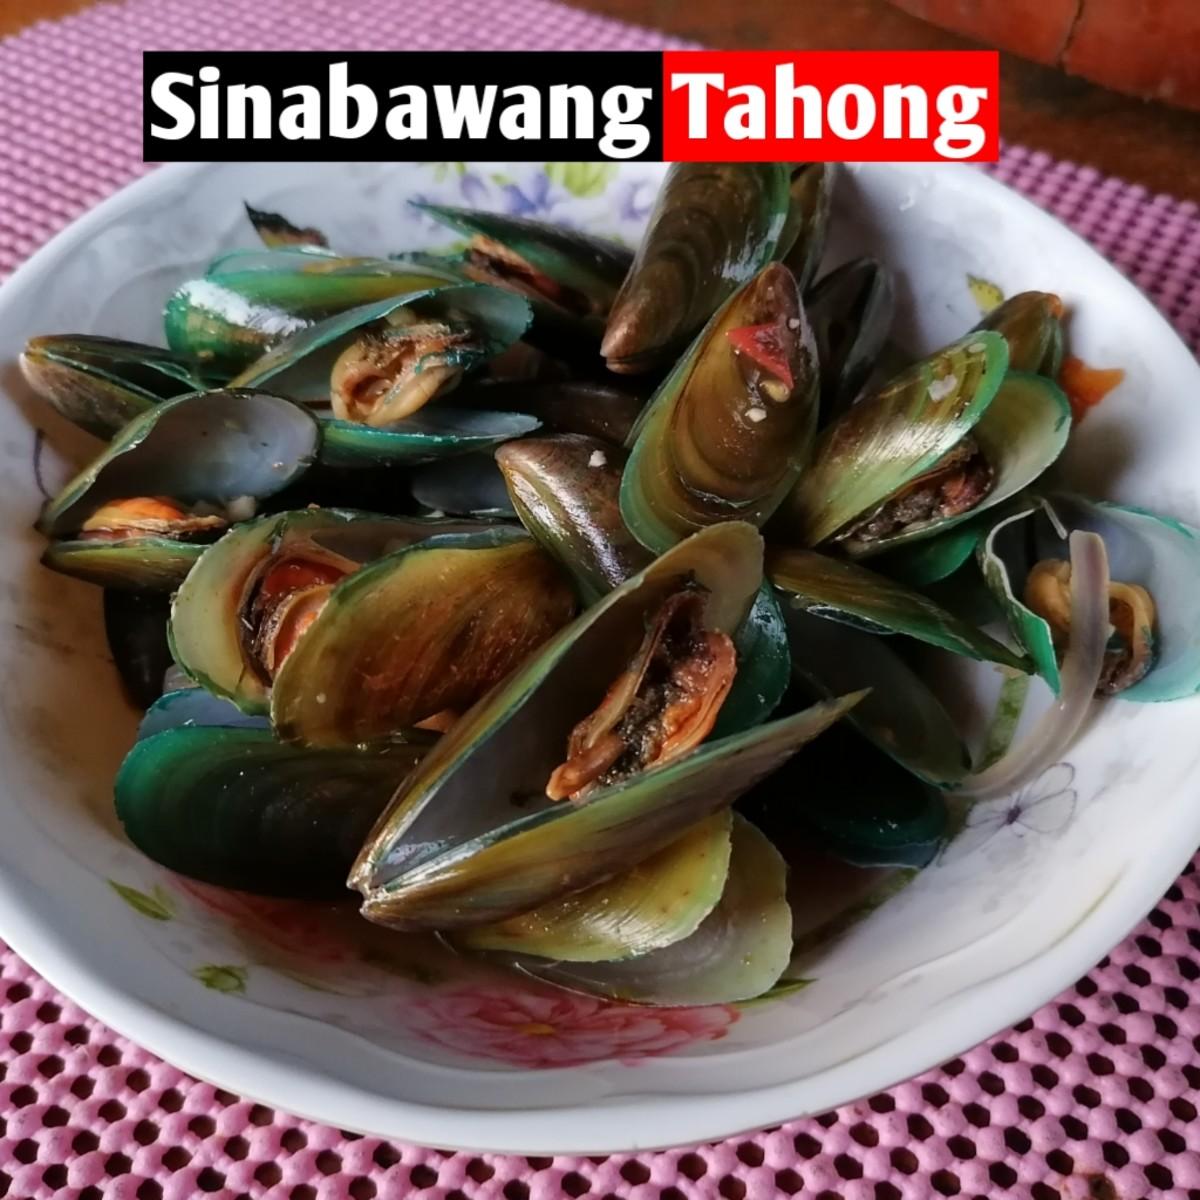 Sinabawang tahong (mussel soup)